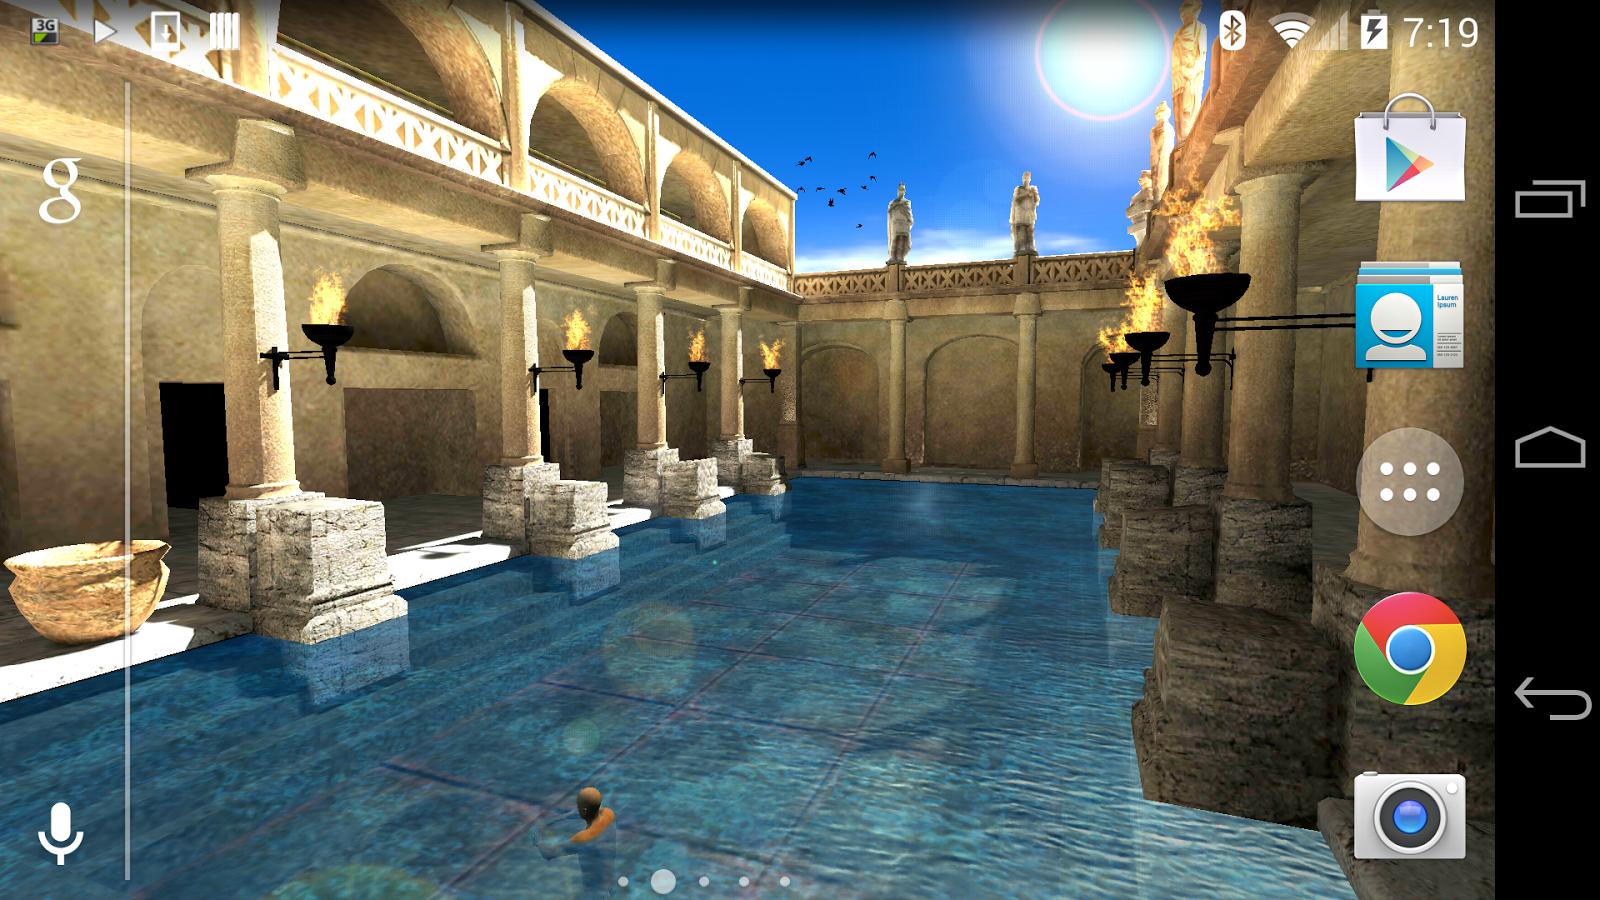 Bathroom specialists product gallery baths downloader -  Roman Bath 3d Live Wallpaper 1 0 0 Screenshot 11